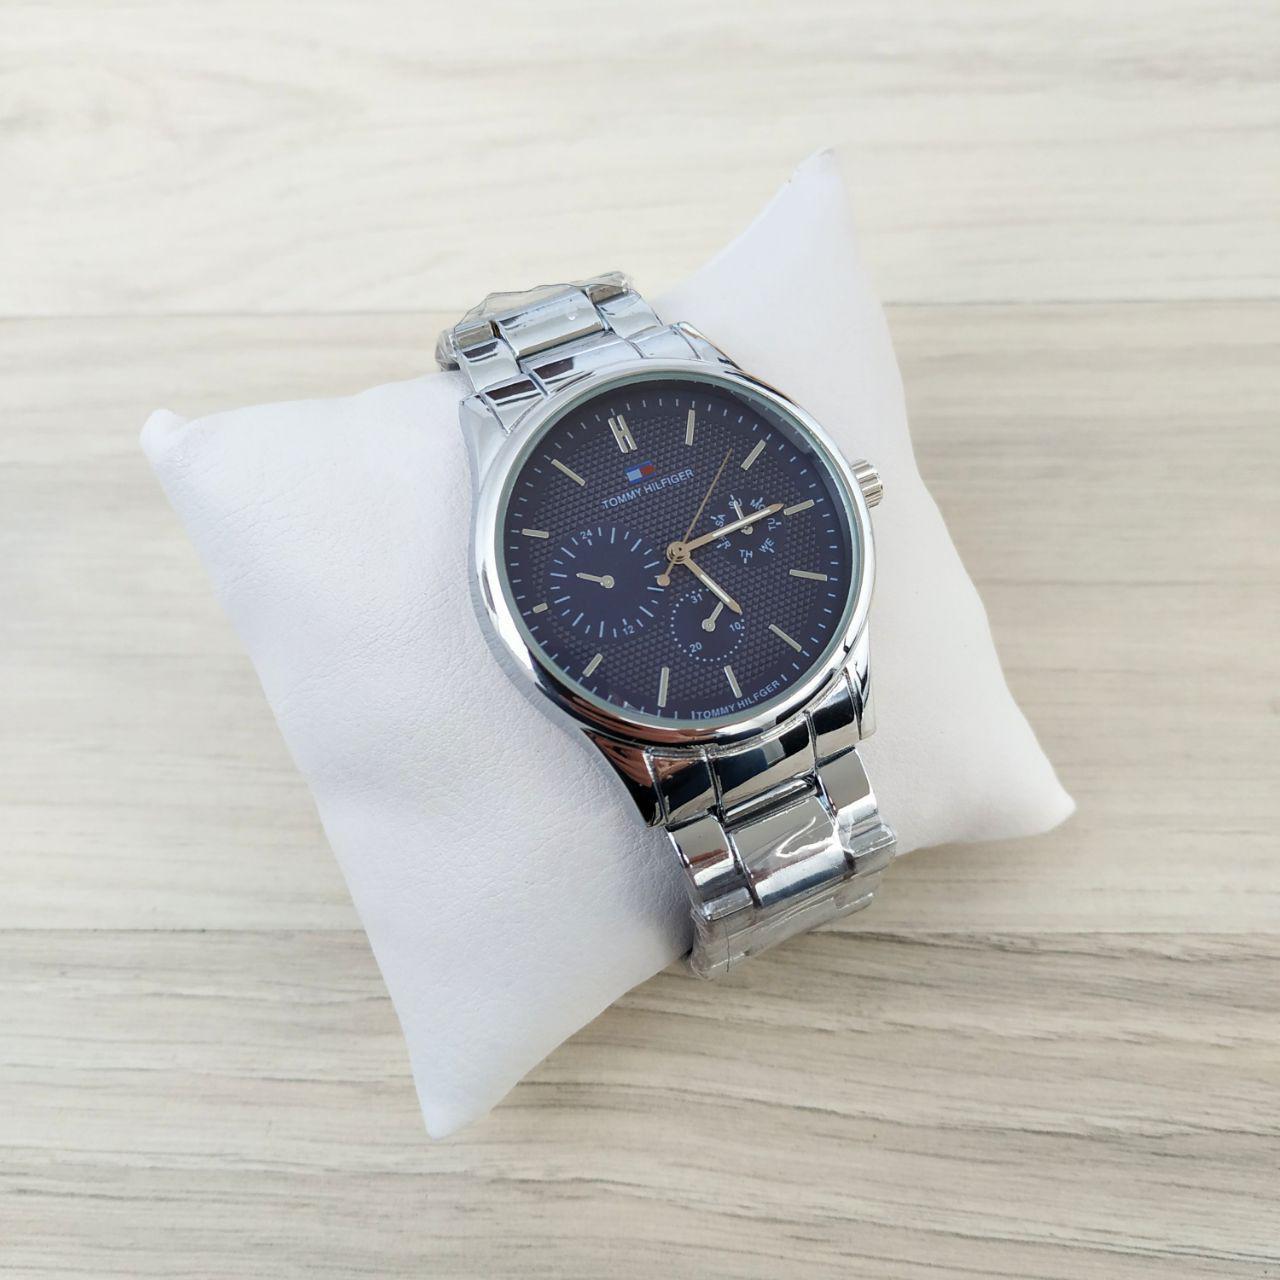 Наручные женские часы Tommy Hilfiger 1074-0137